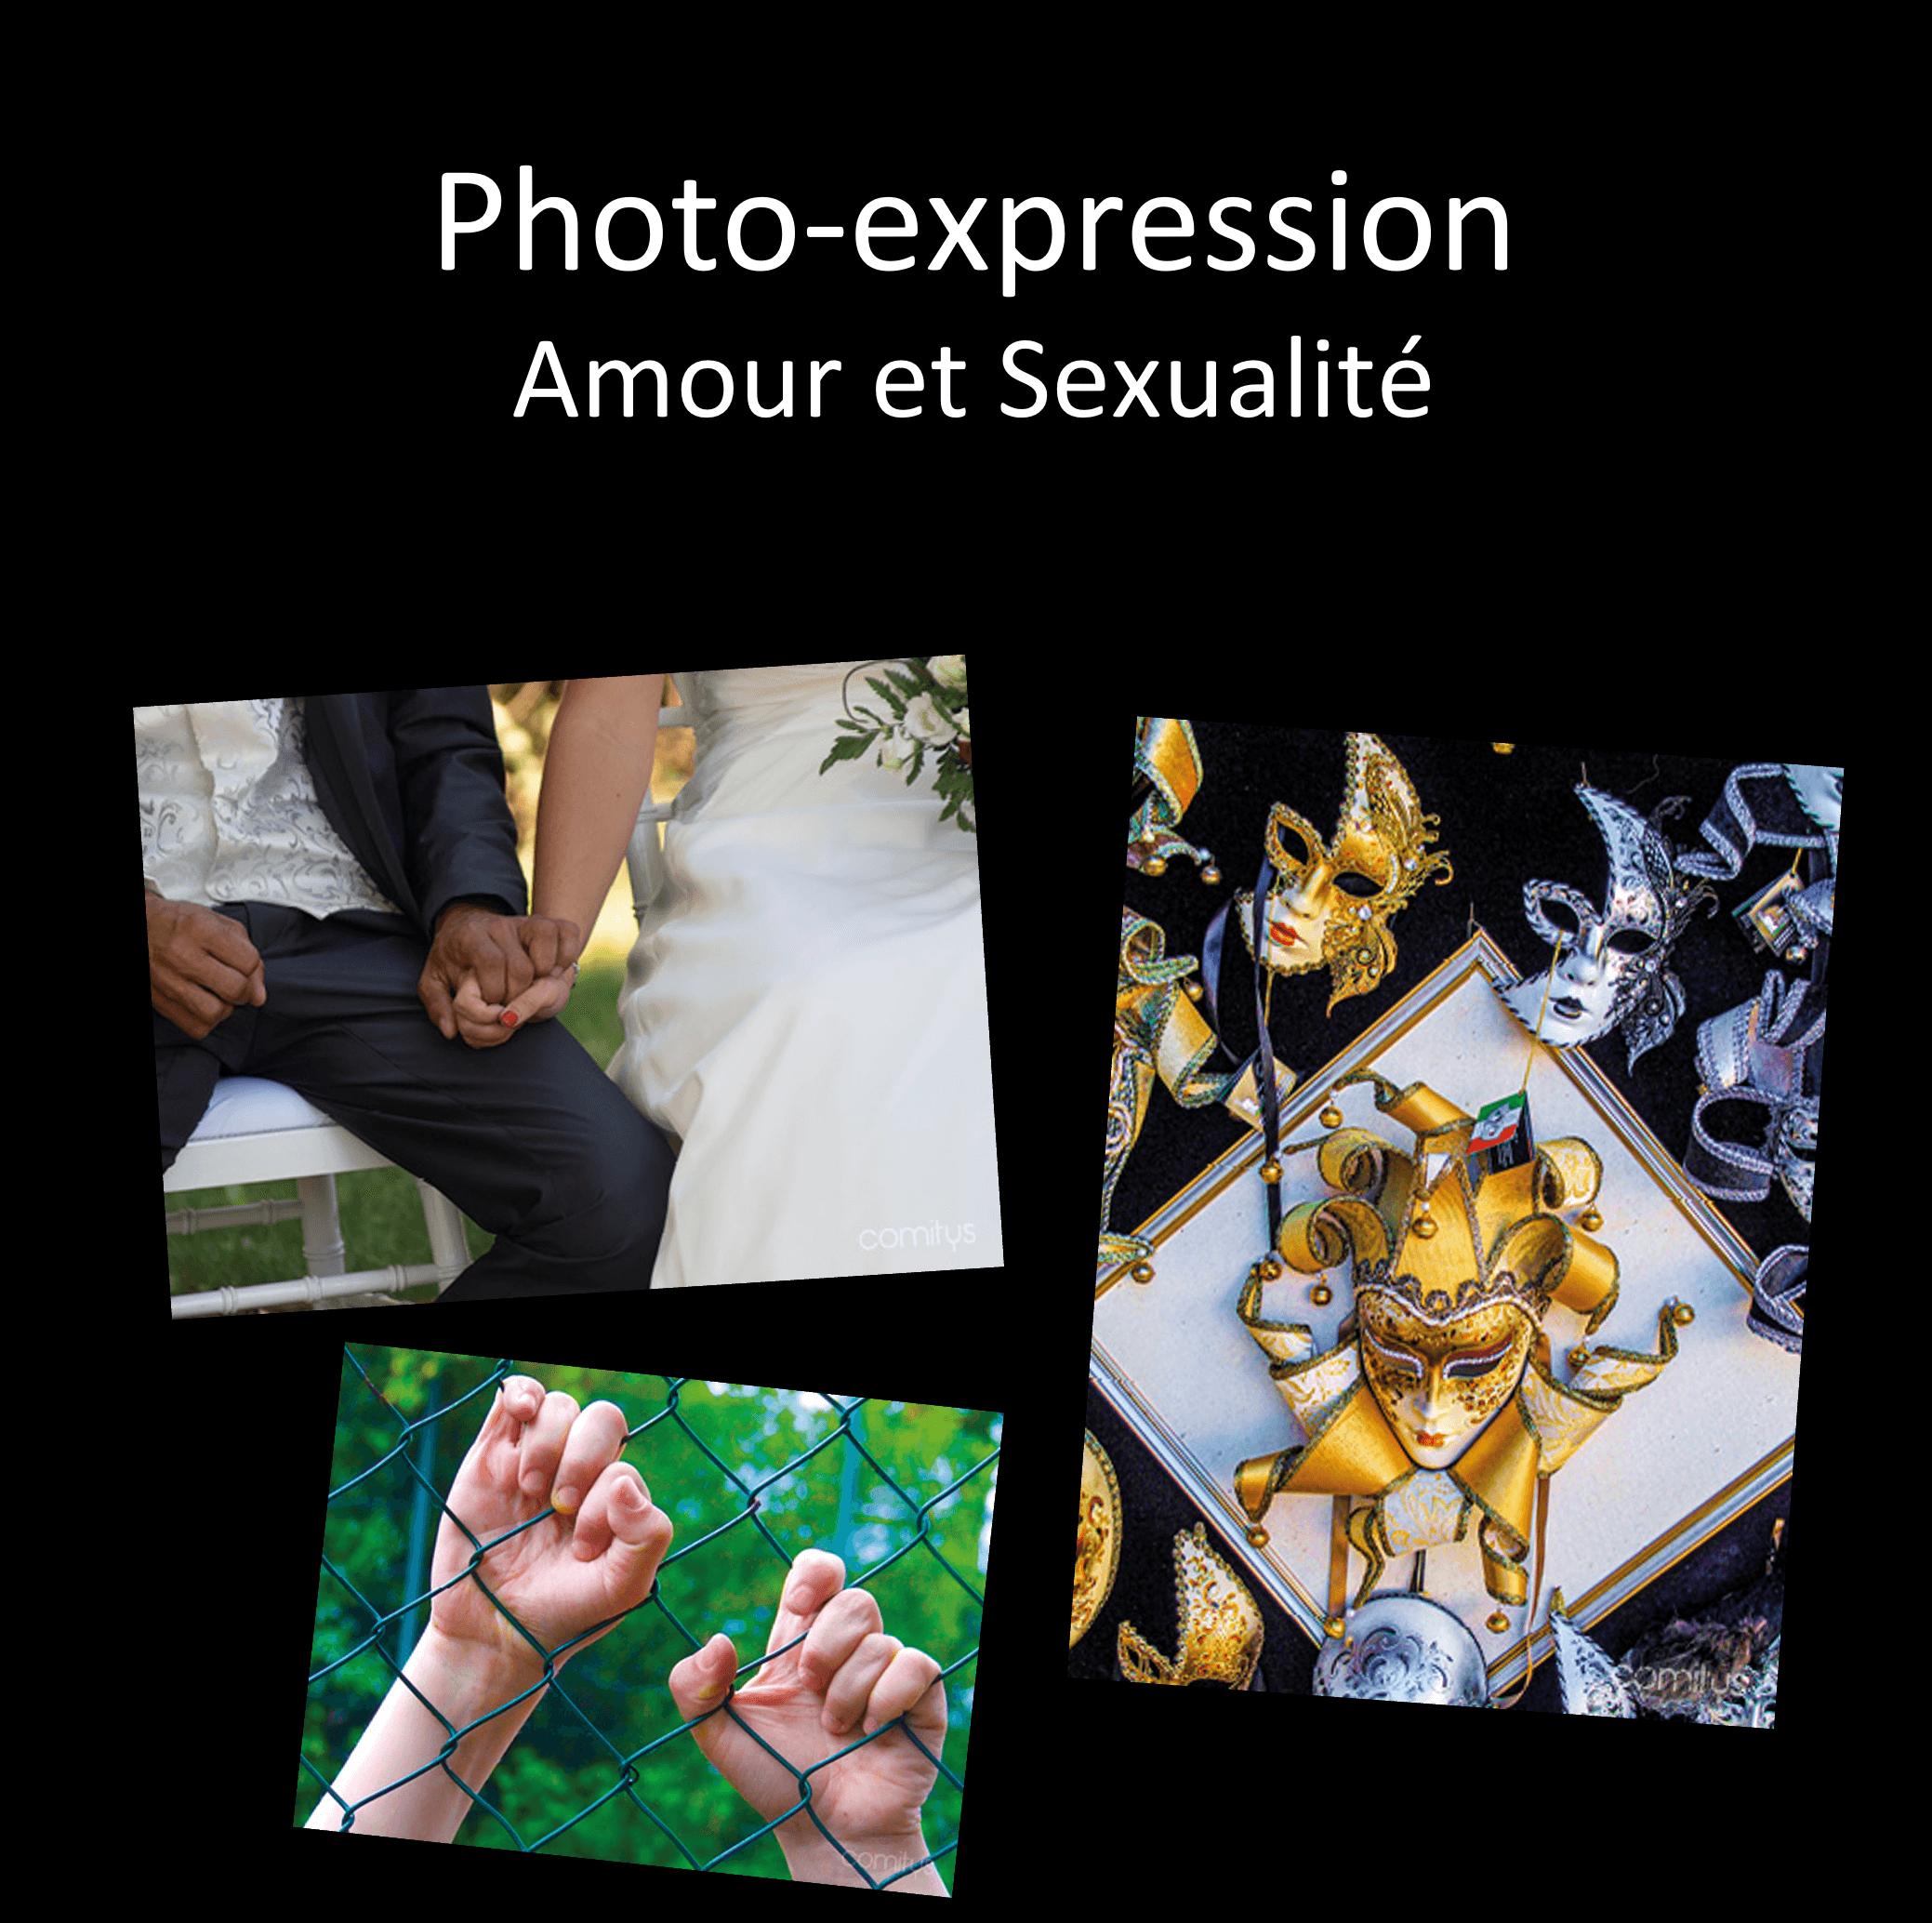 Photo-expression-Amour-et-Sexualite-Comitys evras evars